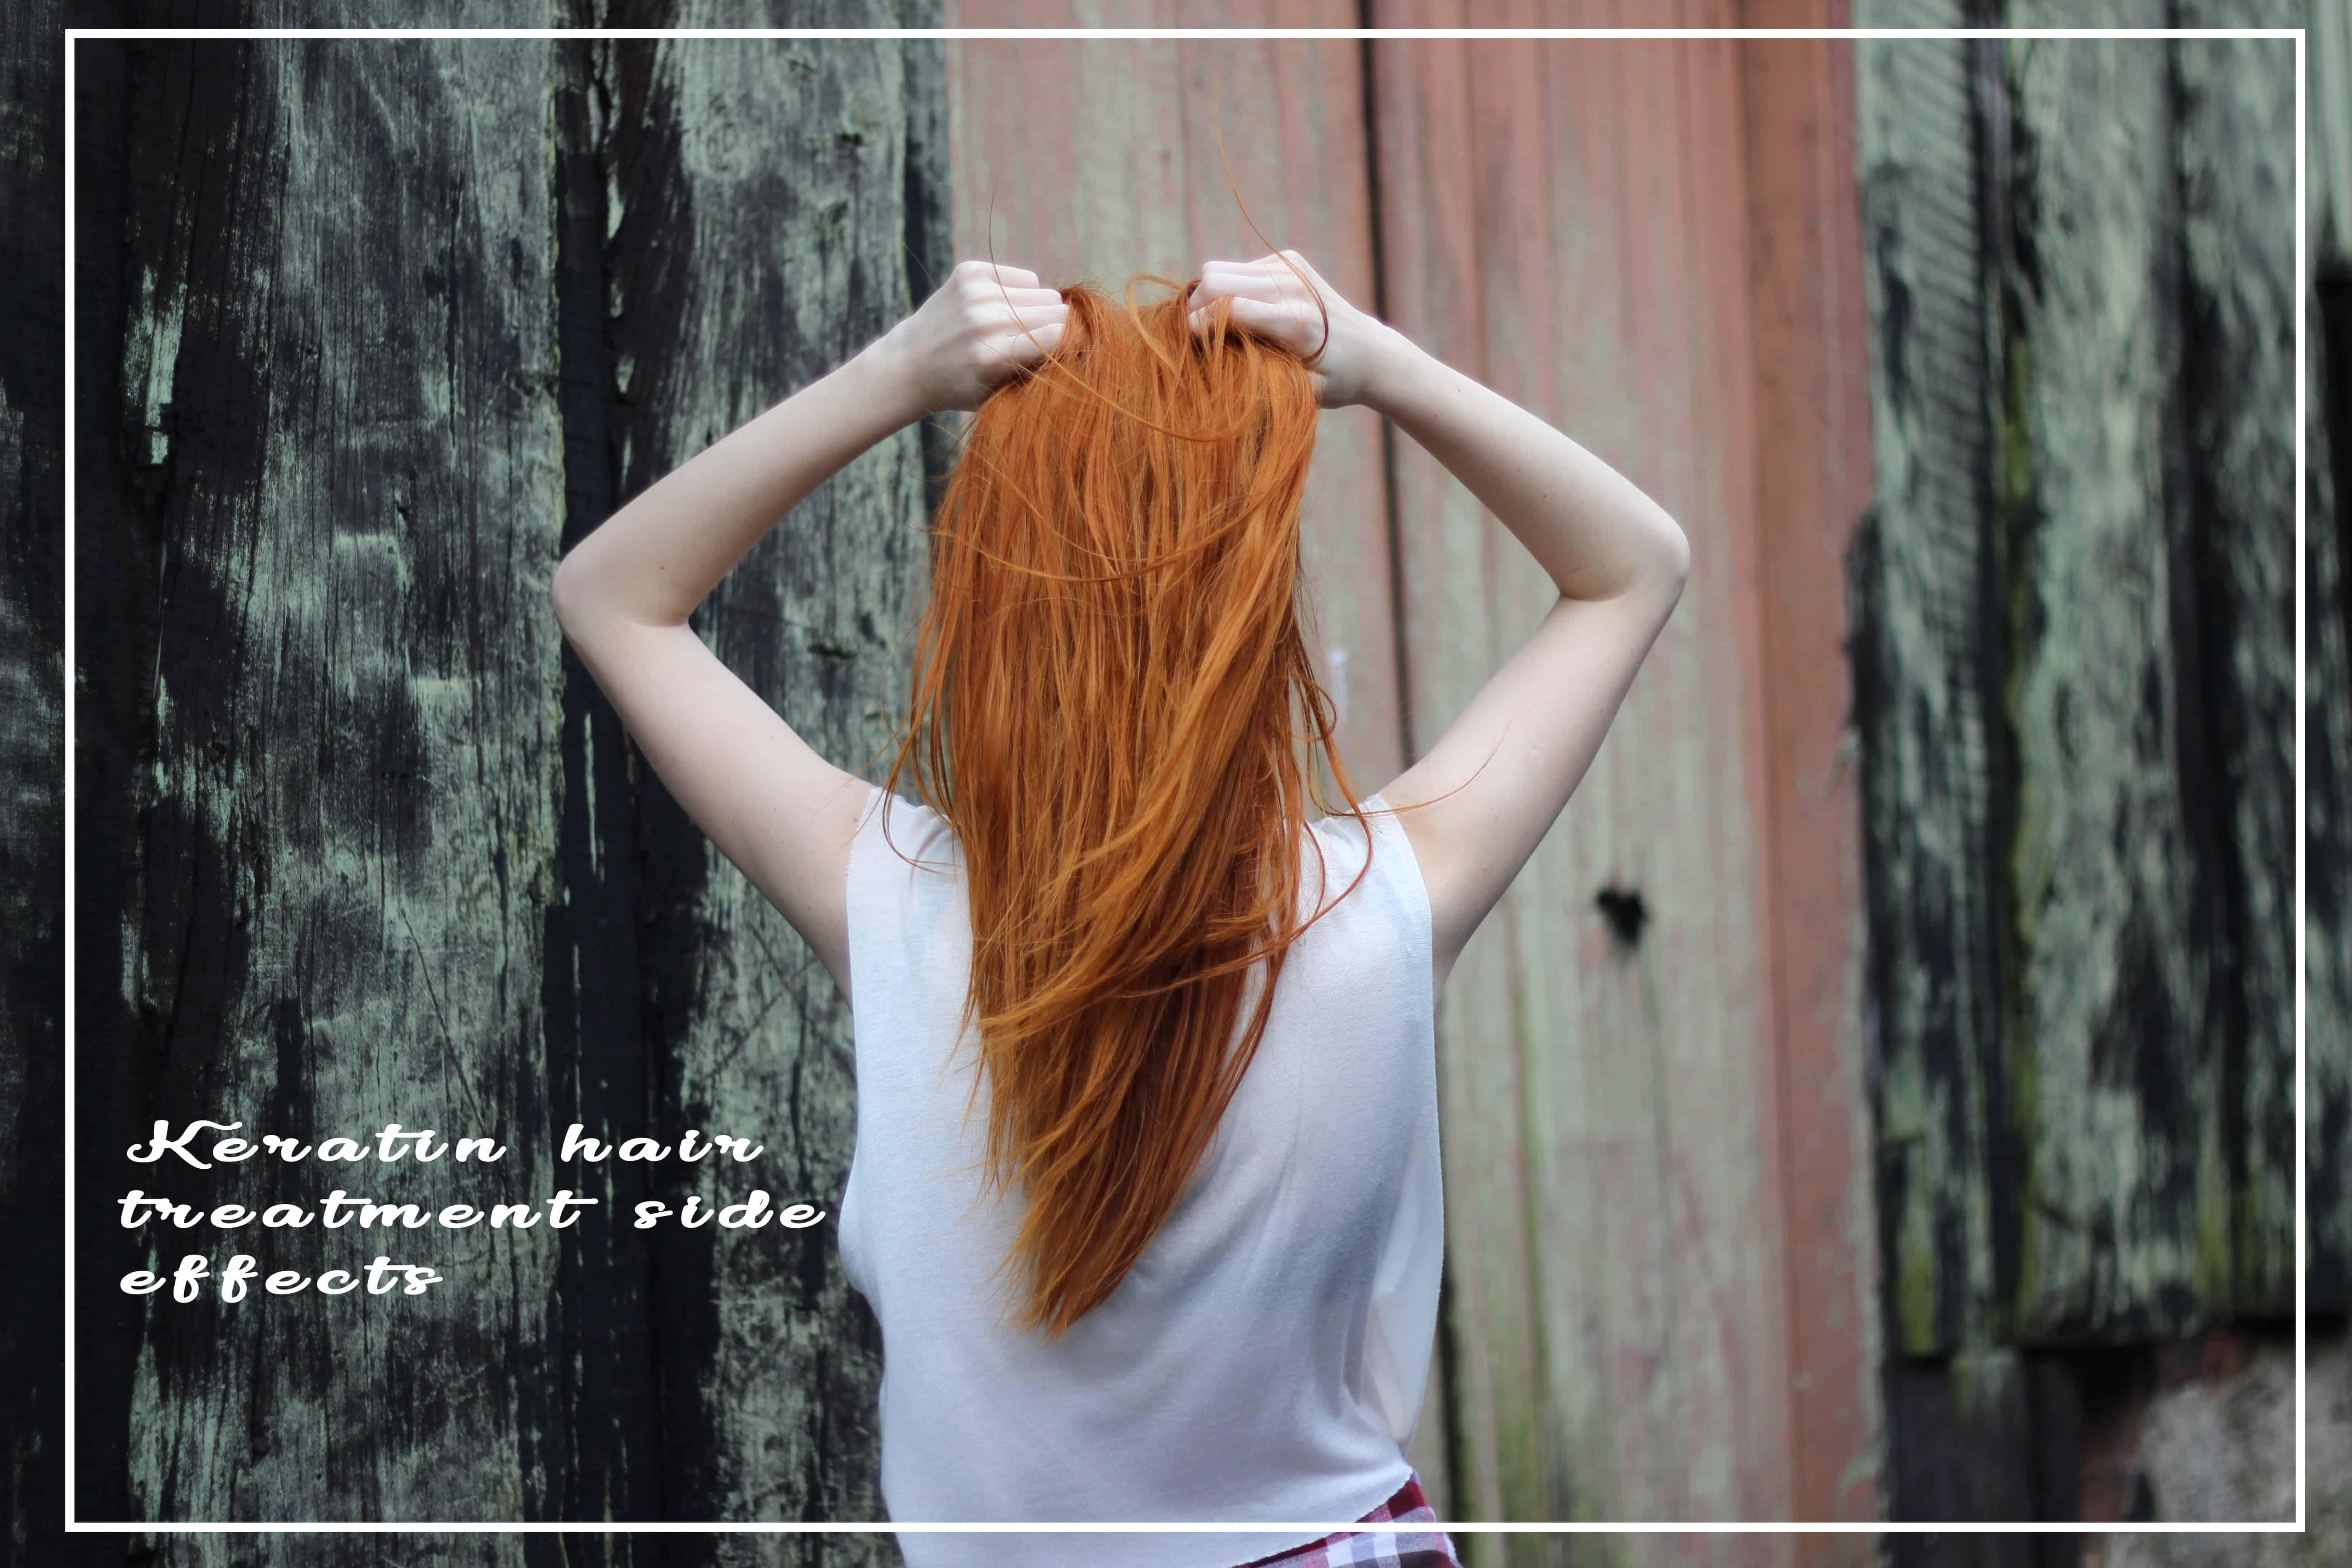 Keratin hair treatment side effects